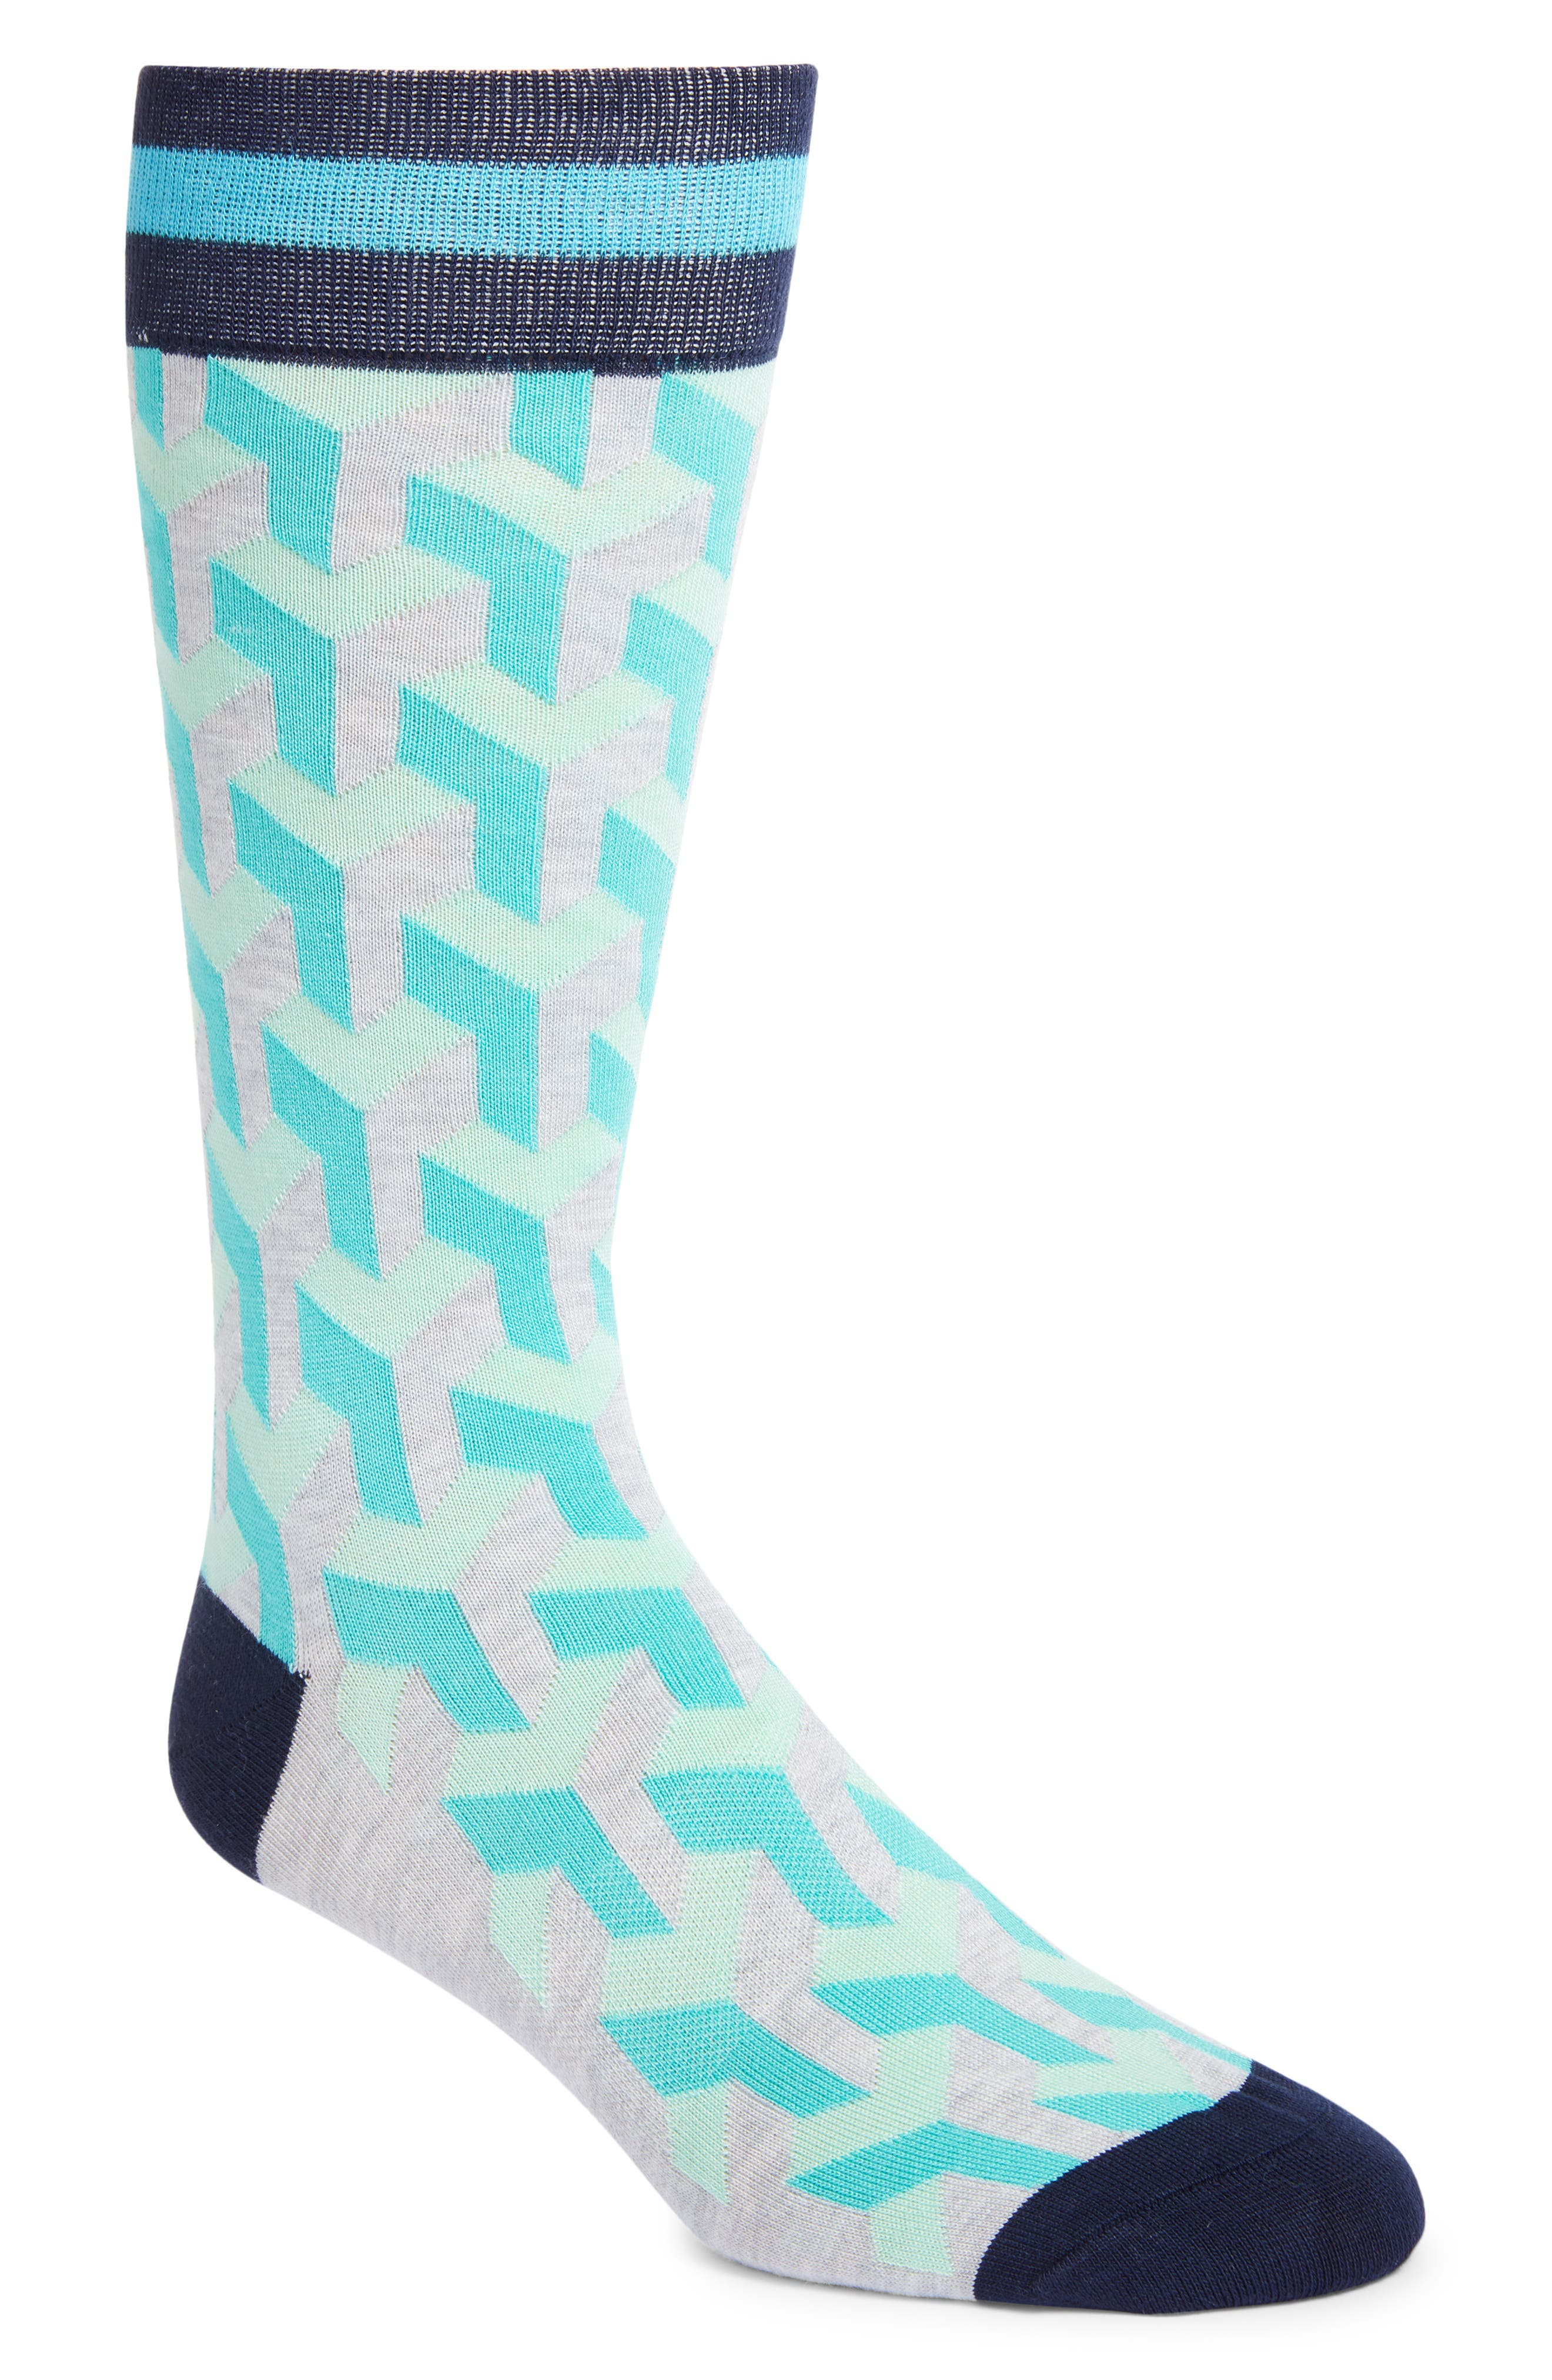 Men's Fun Socks Geo Pattern Socks